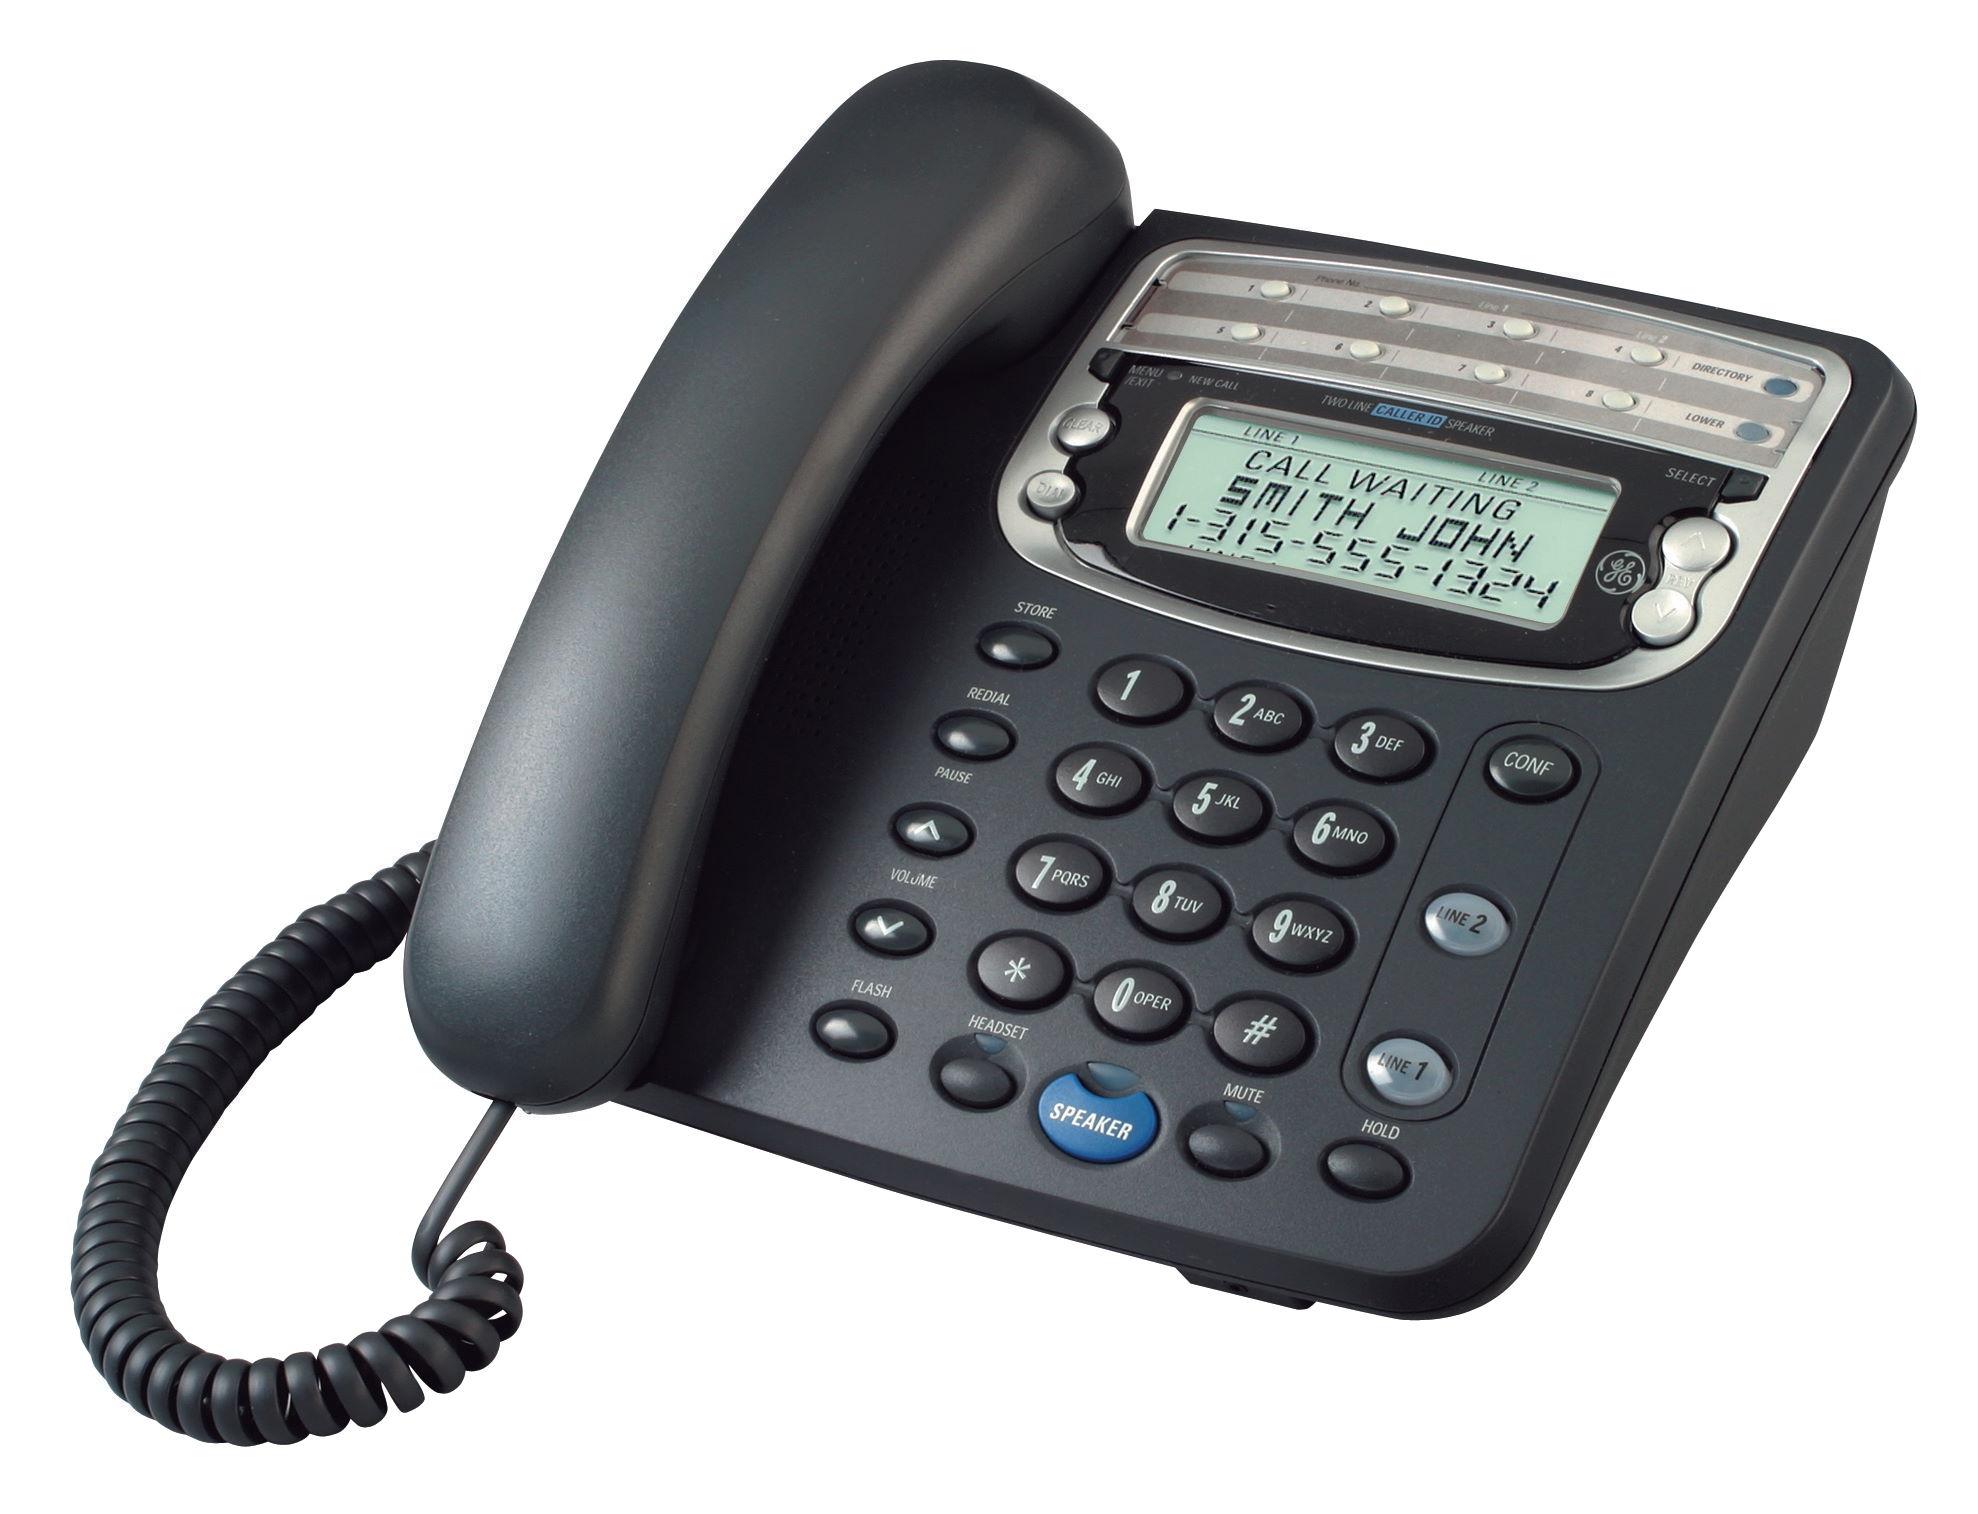 small office home office phones by Brett Rathmell at Coroflot.com